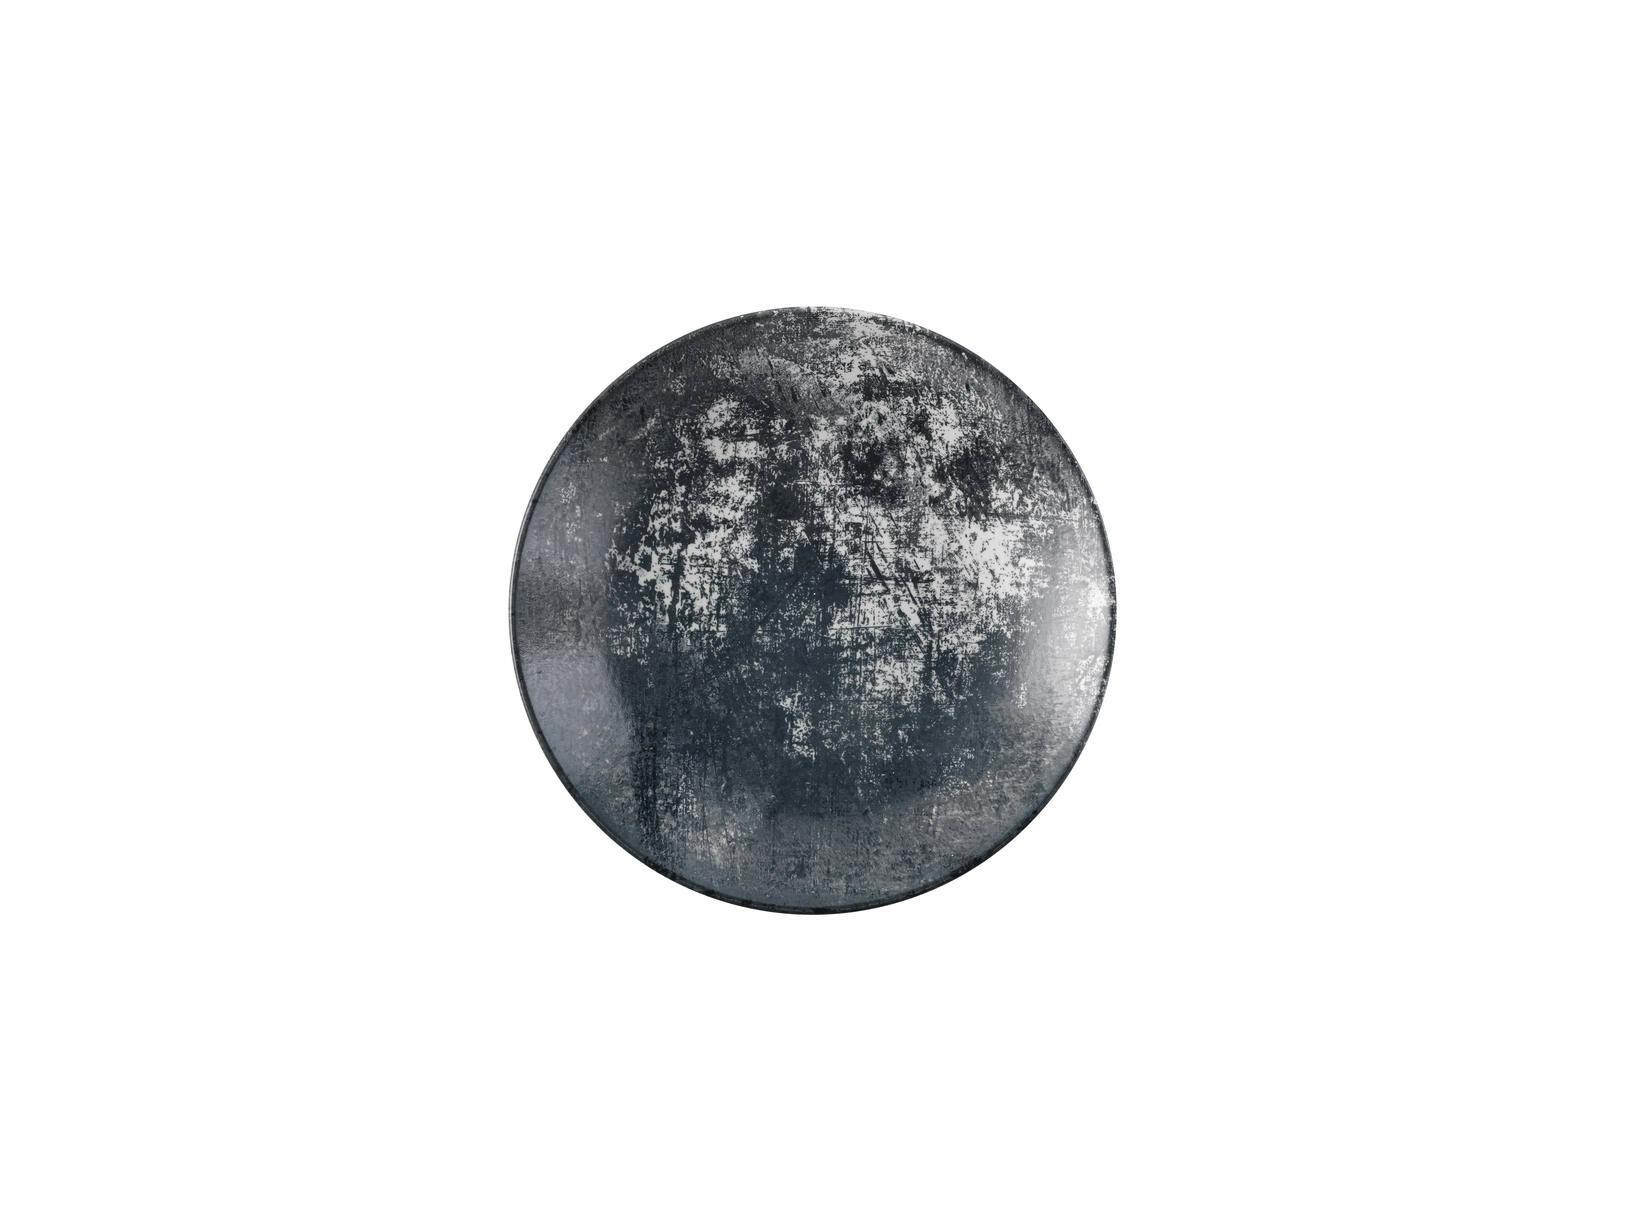 Dudson Urban Lamp Black diep coupe bord 28,1 cm